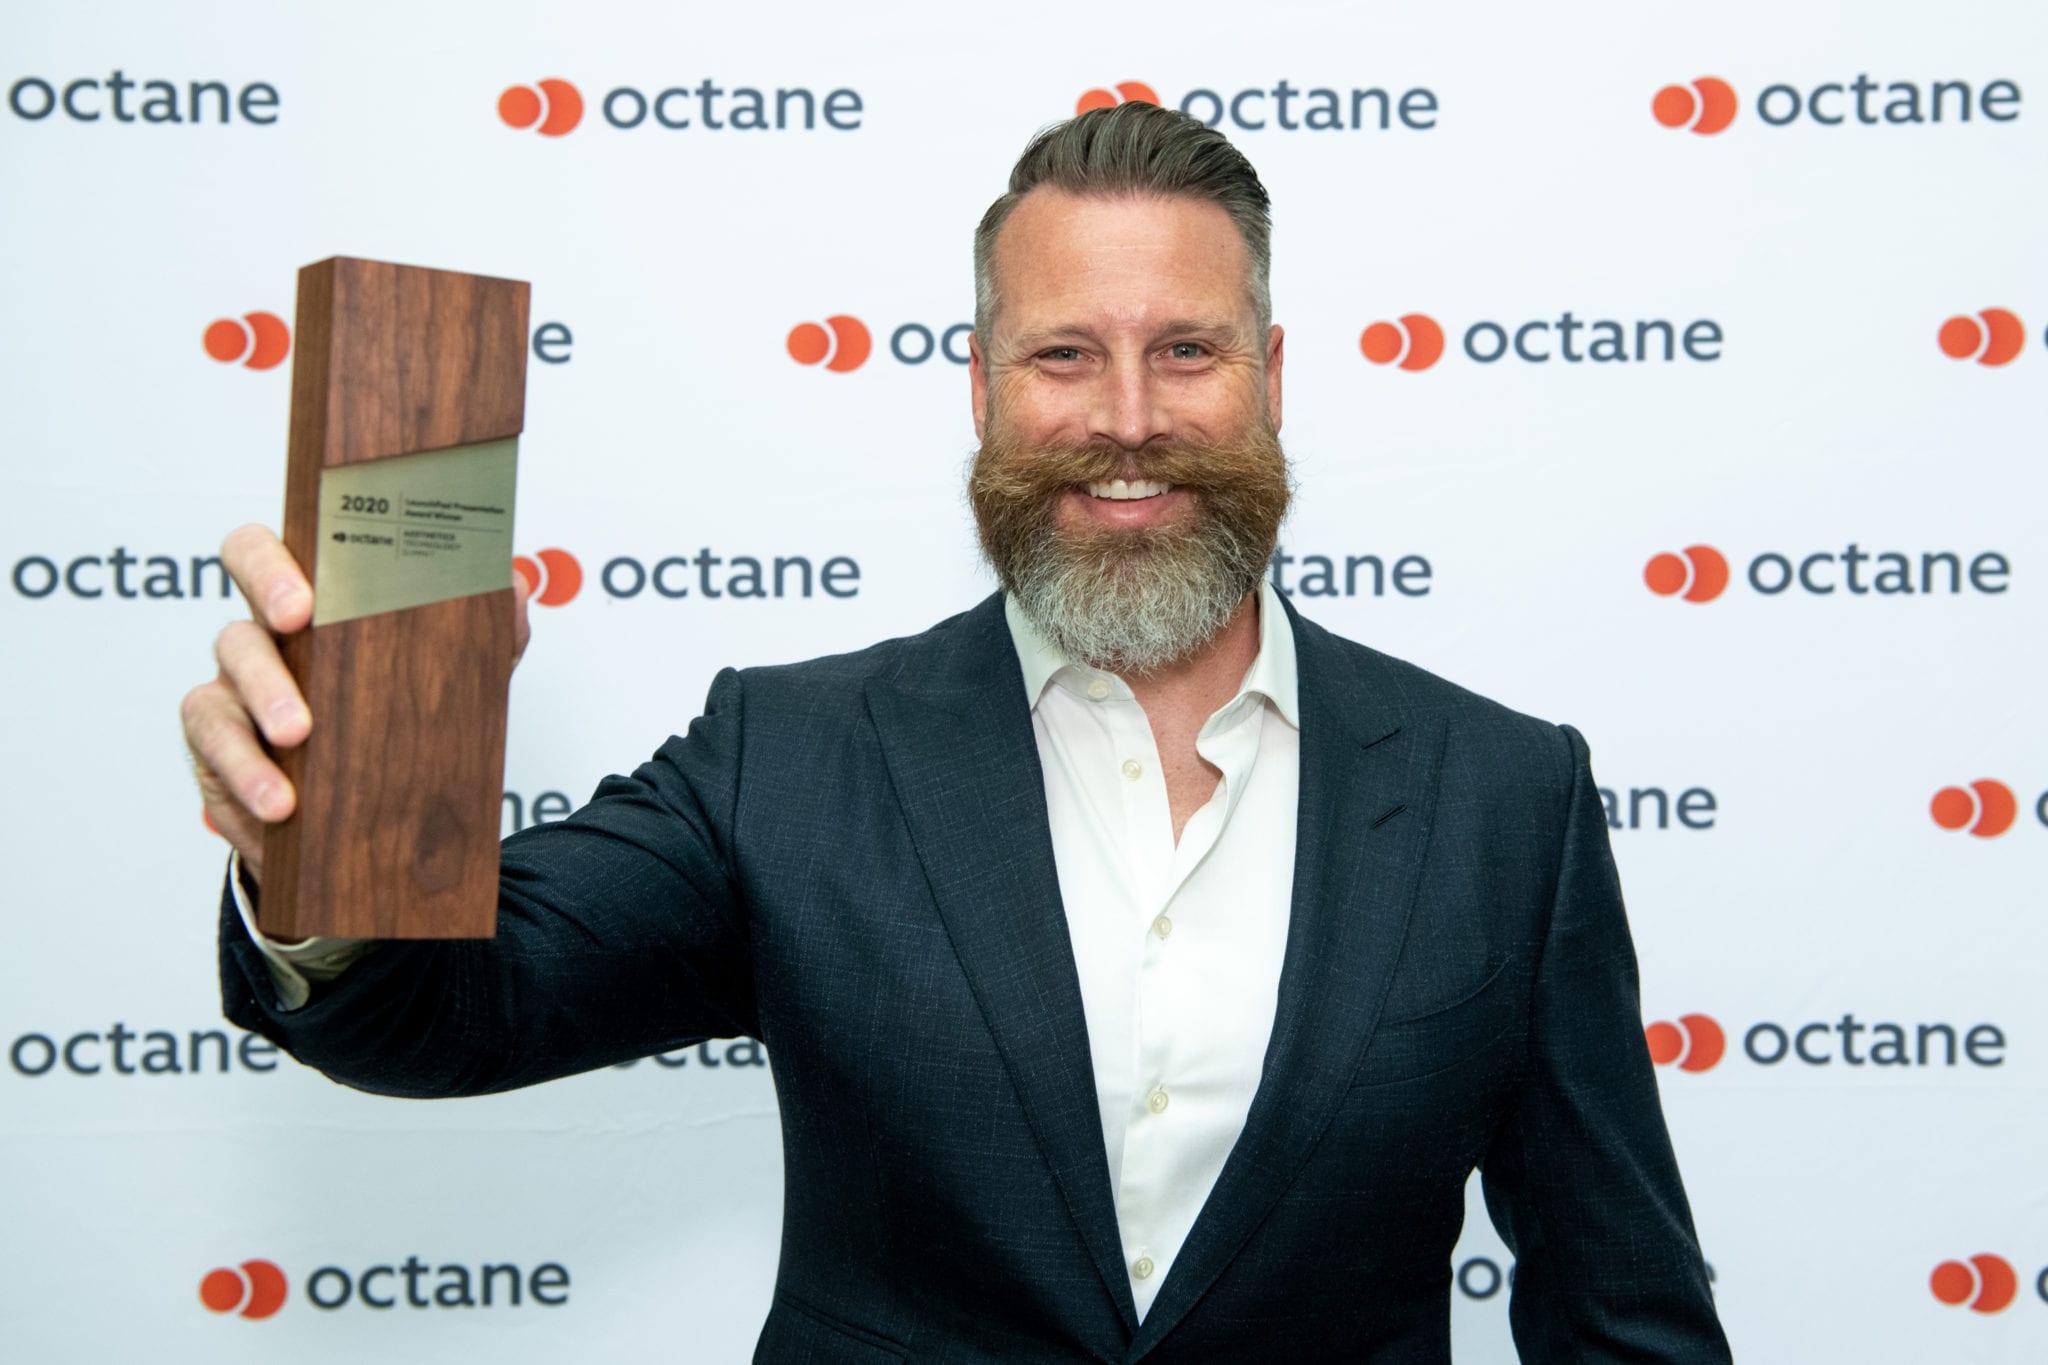 Robert Towles, finalist at Octane's HTA 2020